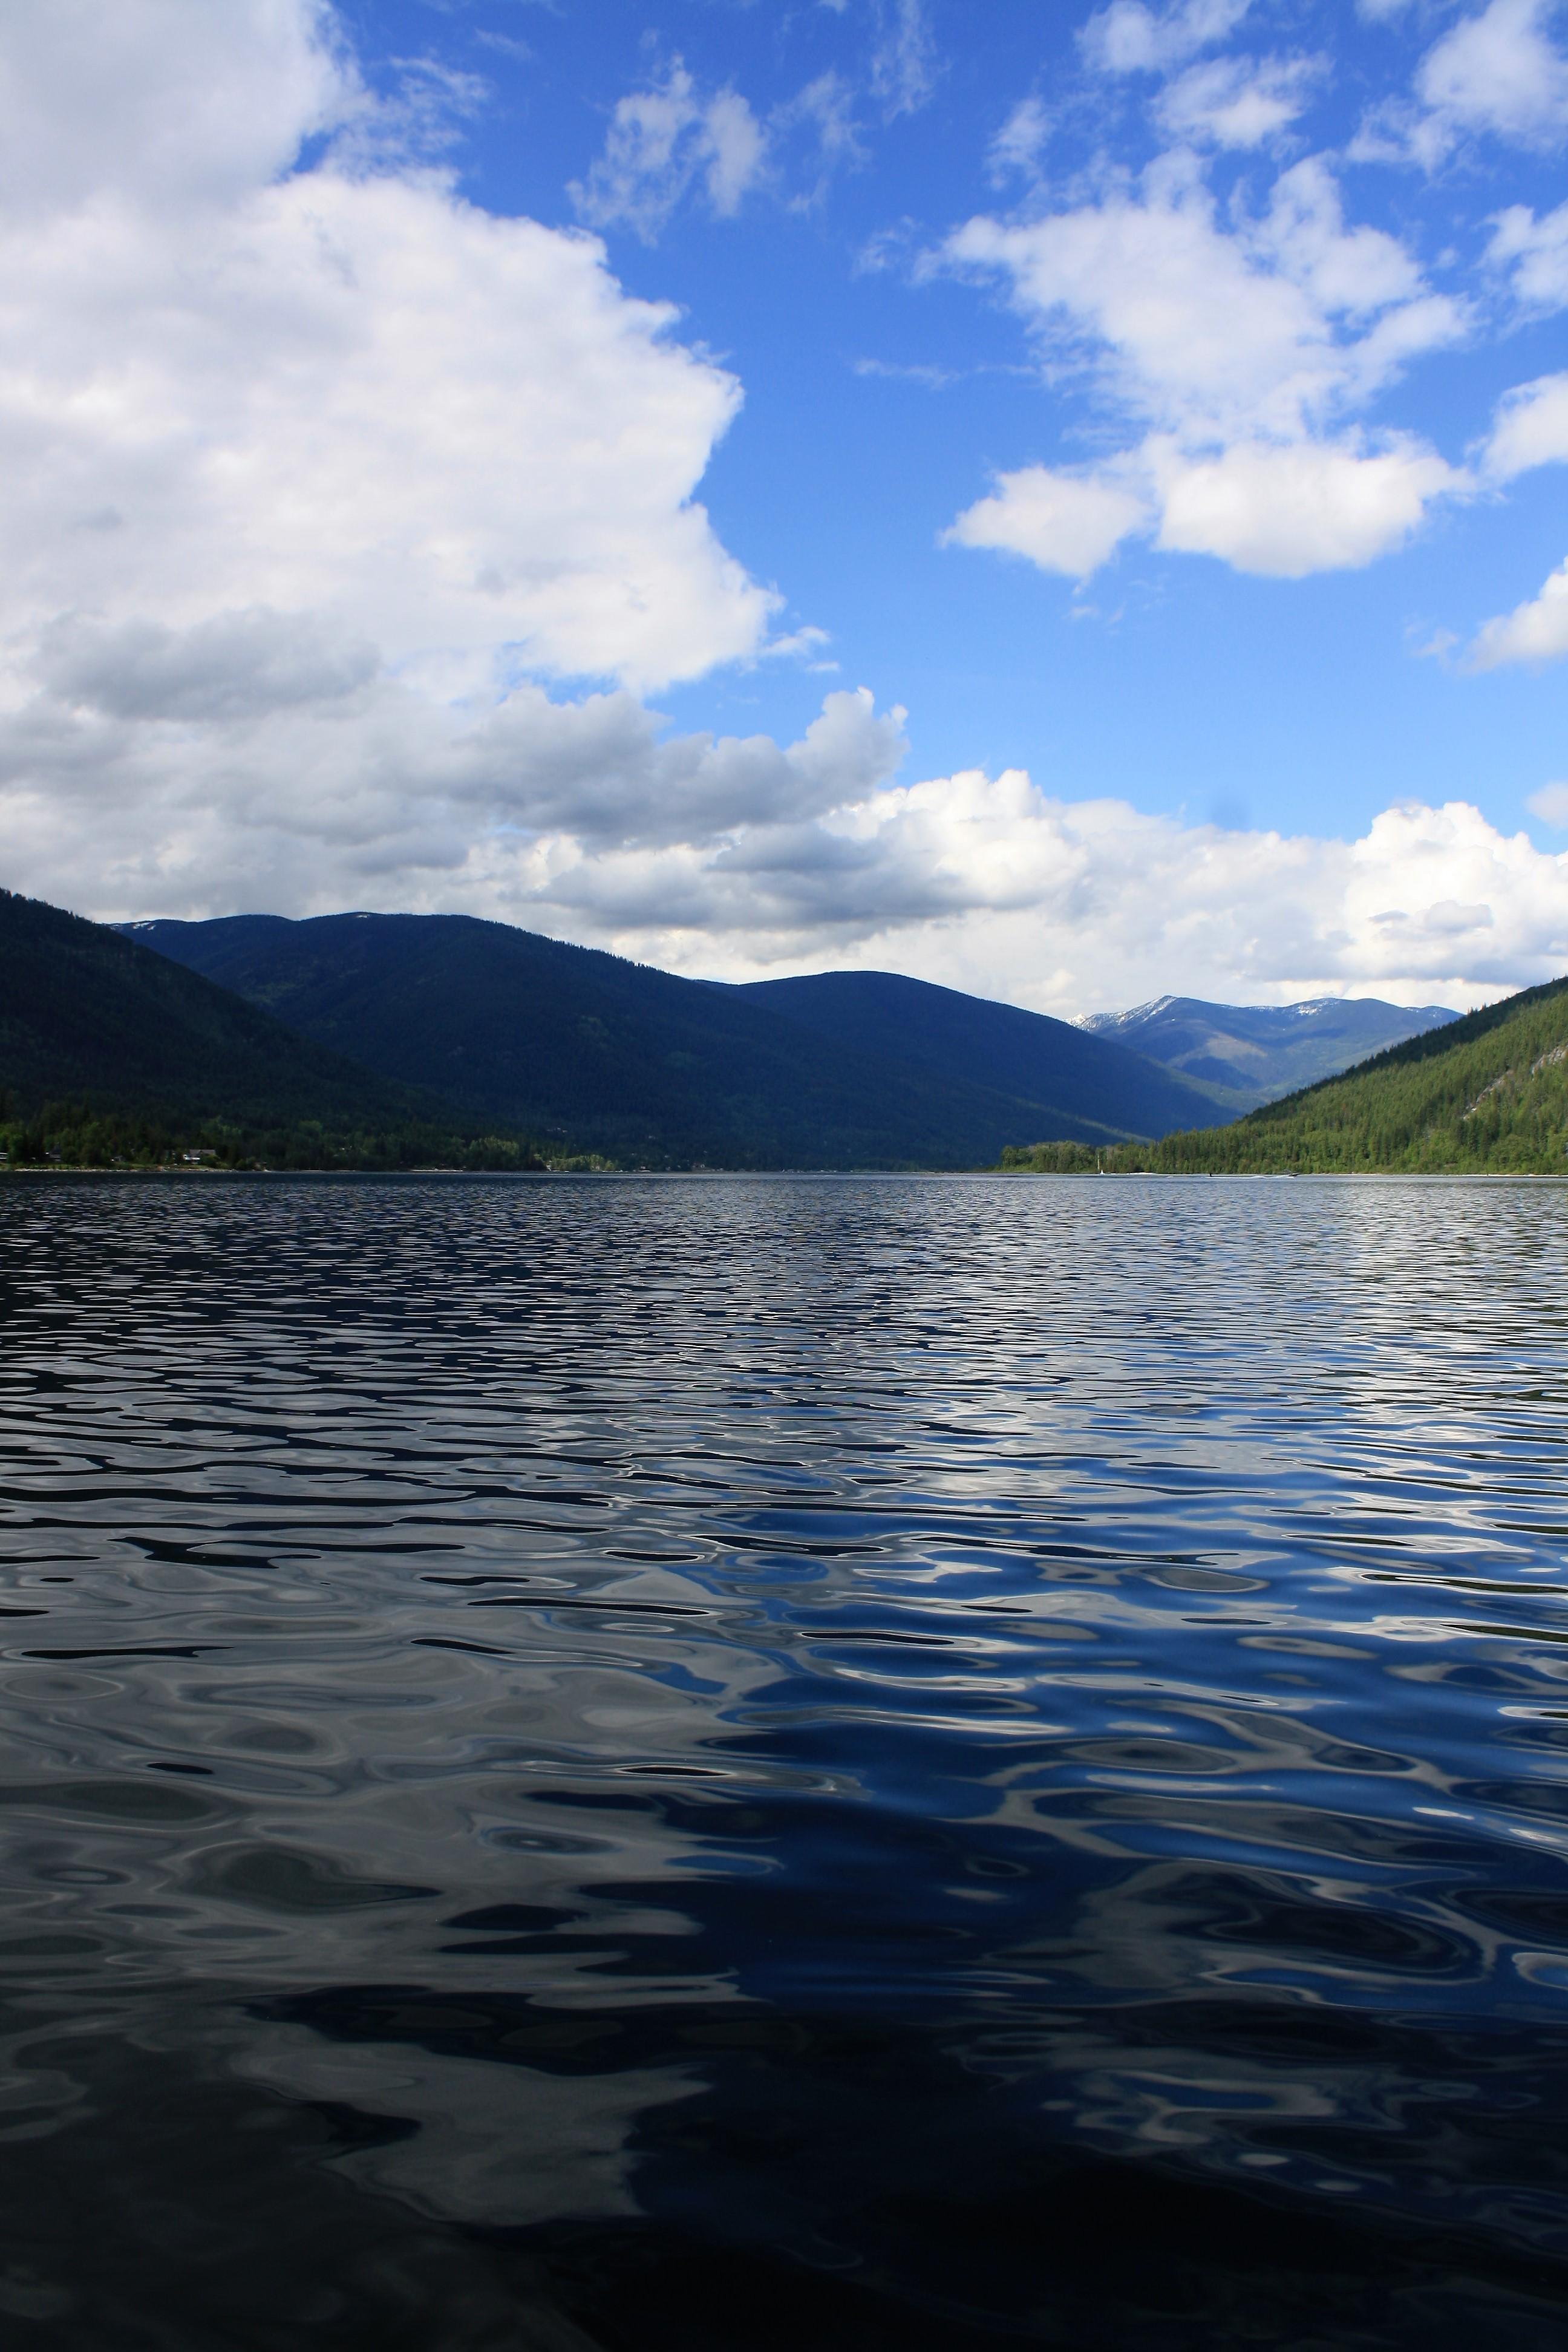 DM_nature_landscape_oceanwater_nelson_88